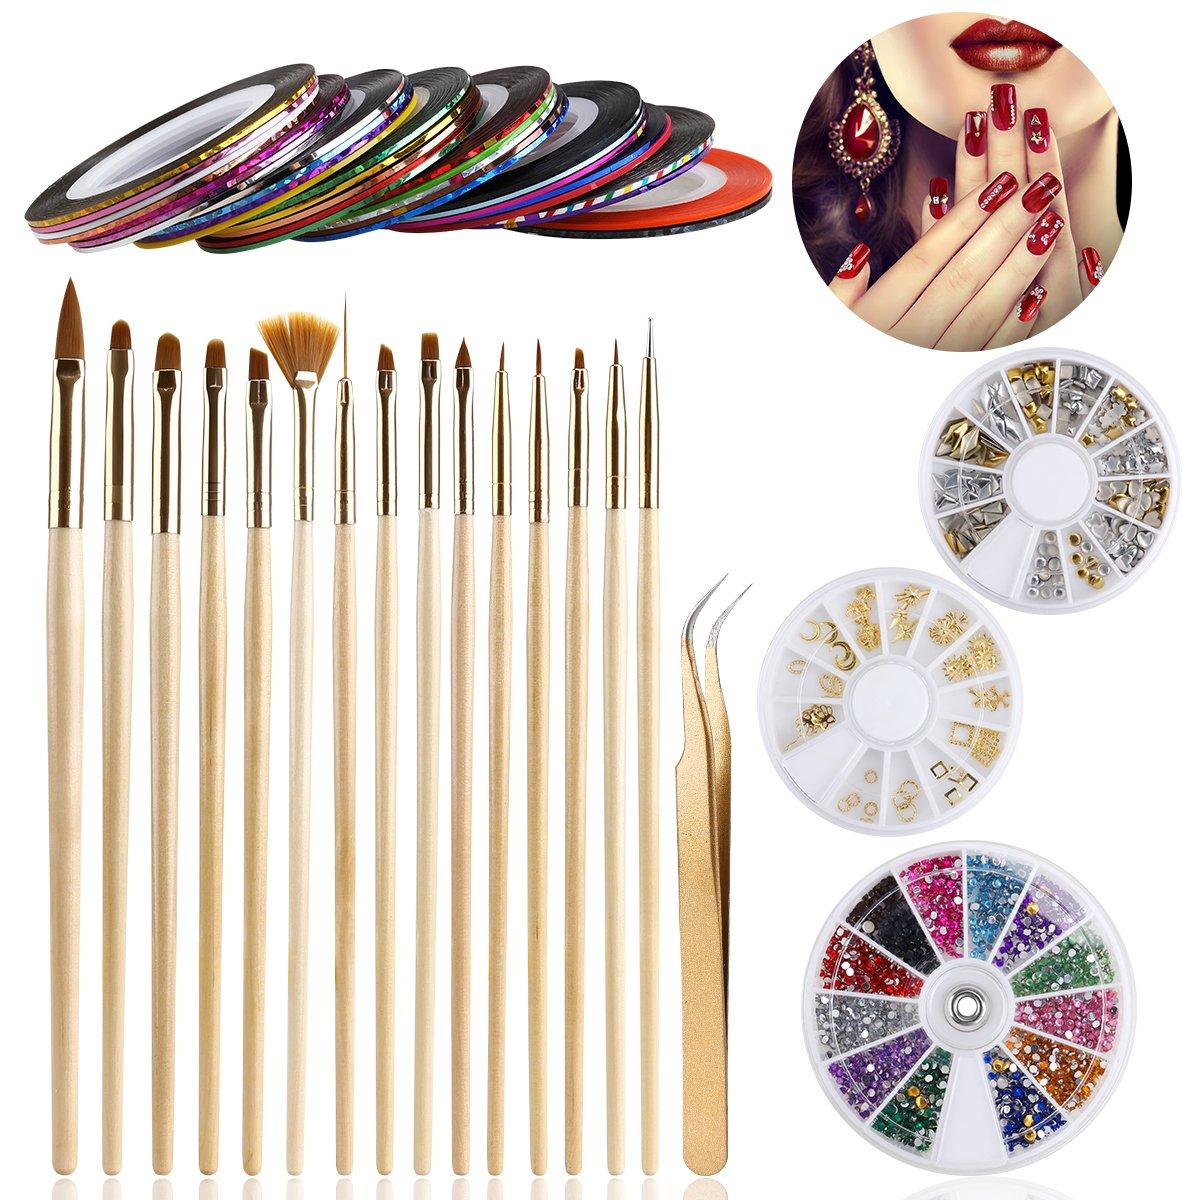 ETEREAUTY Nail Art Kit Includes 15 Nail Art Brushes, 30 Rolls ...